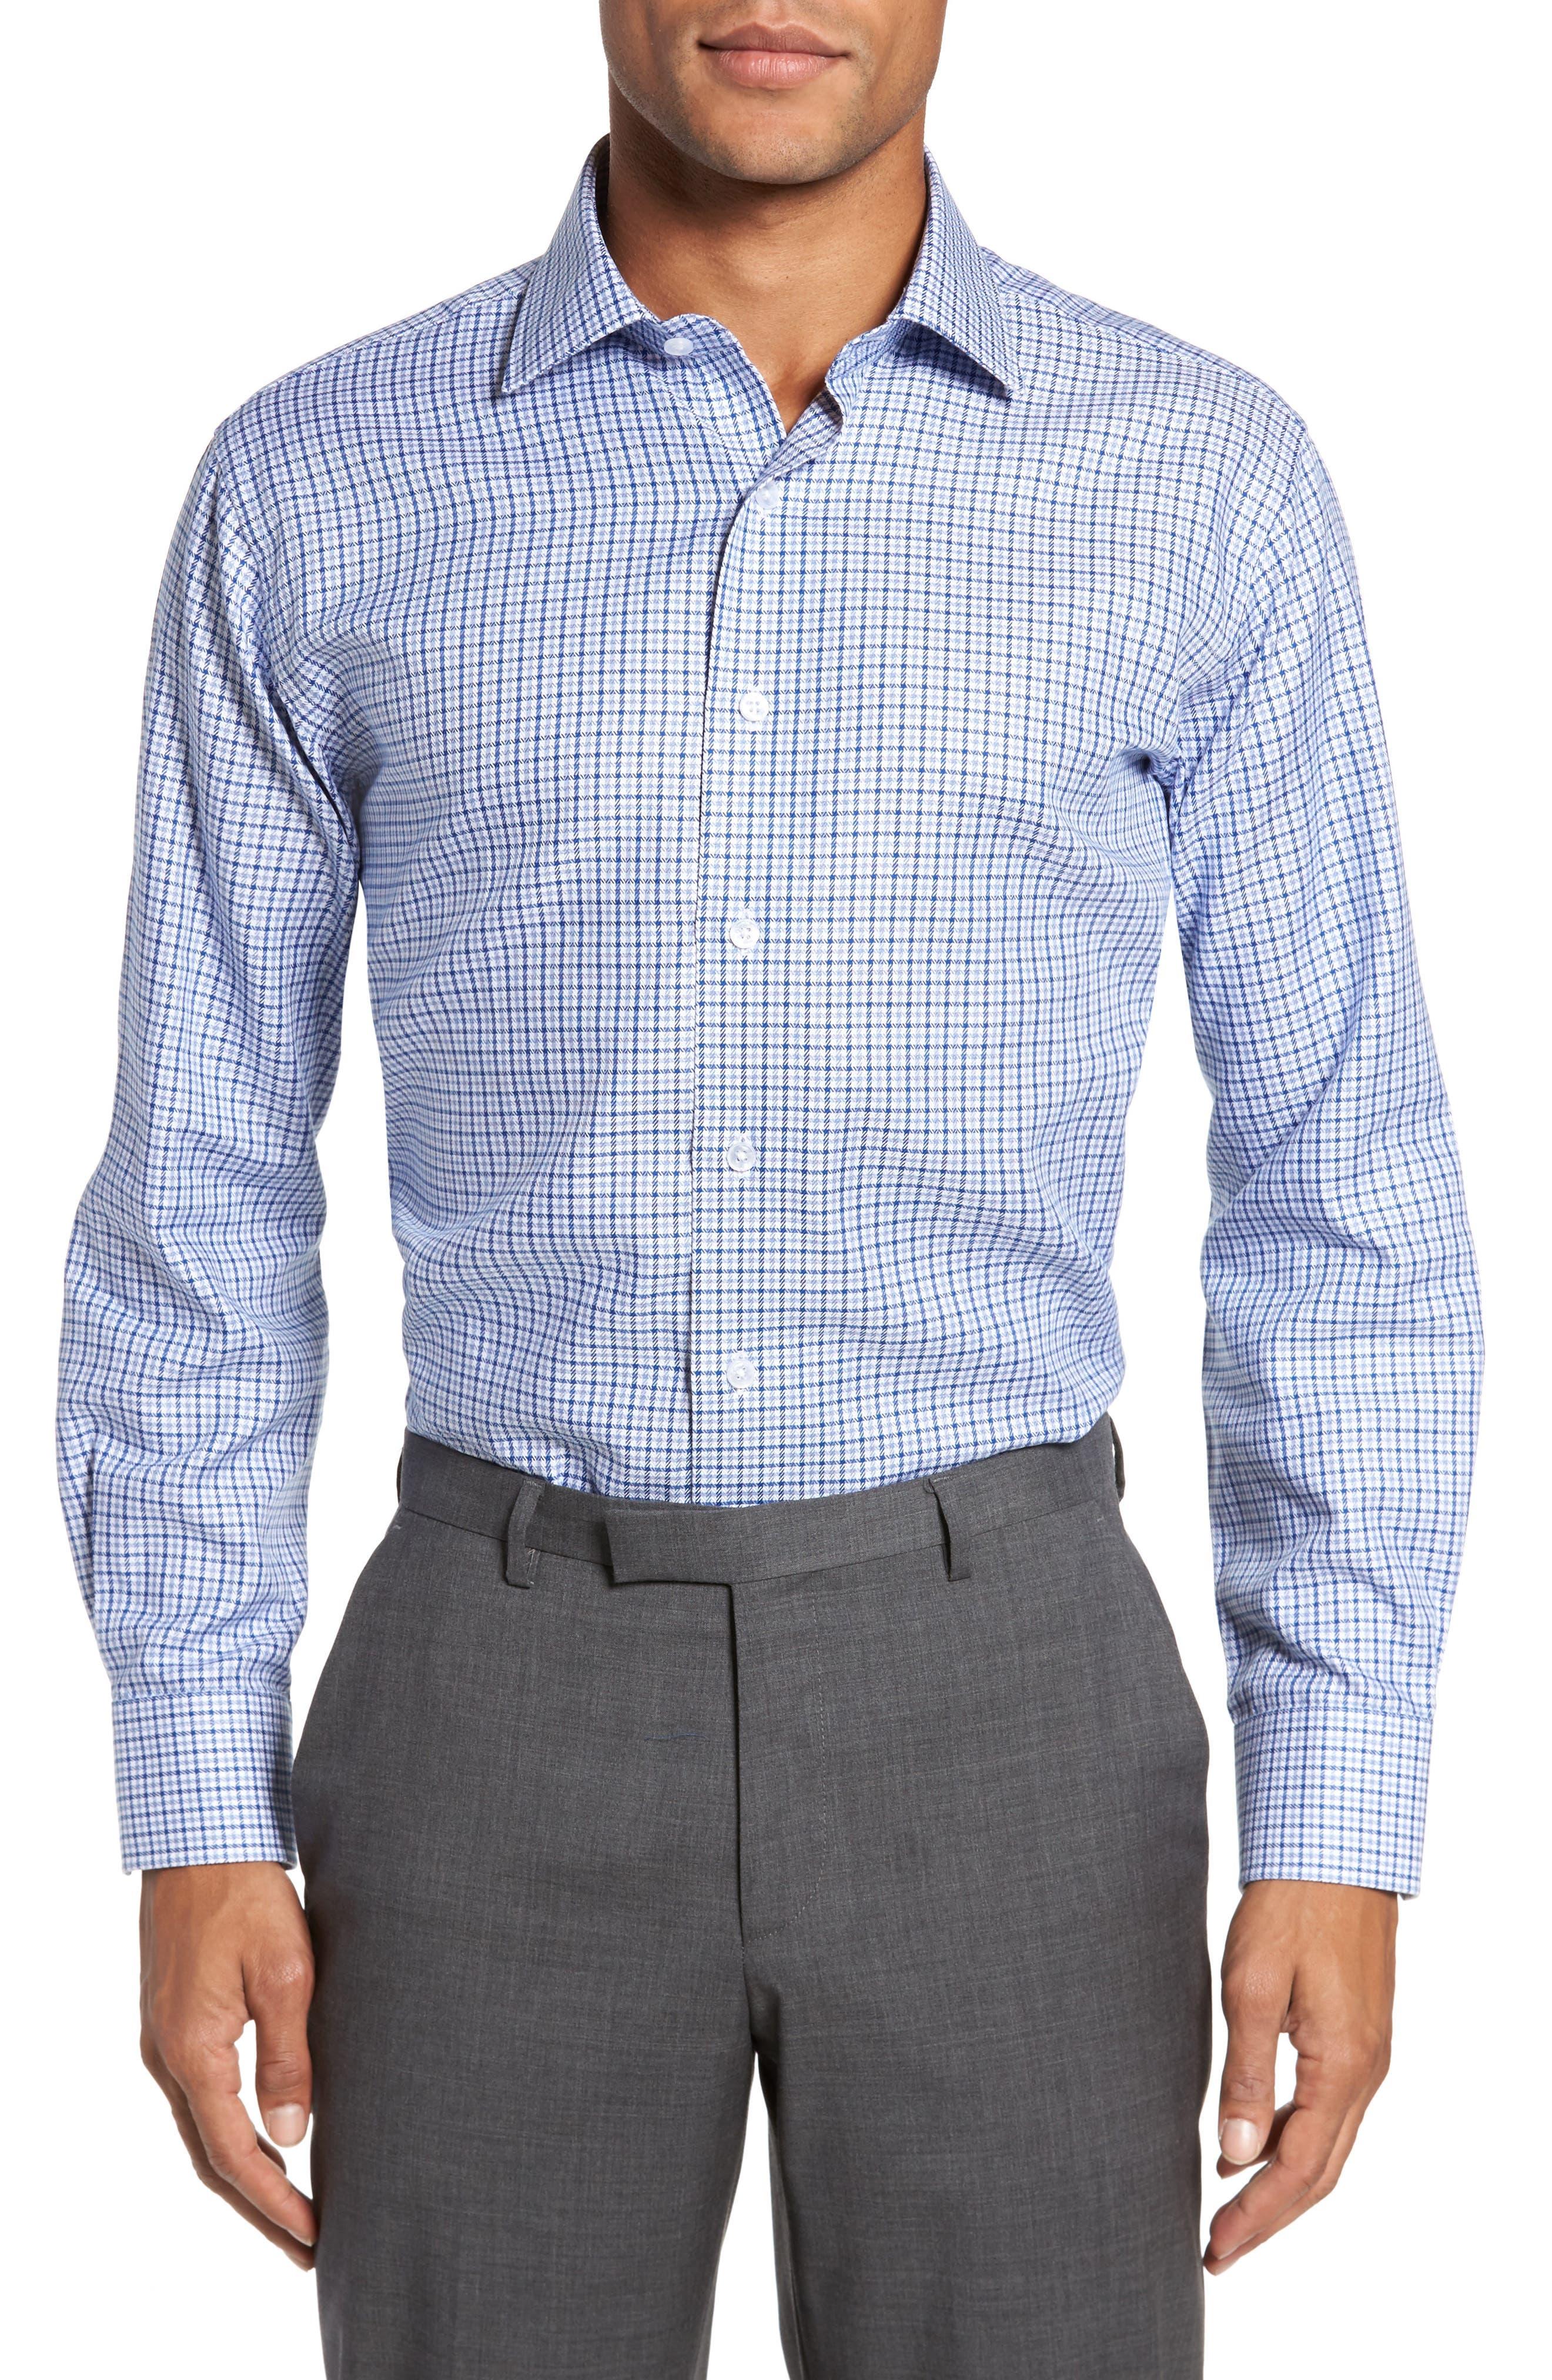 LORENZO UOMO Trim Fit Textured Check Dress Shirt, Main, color, 410